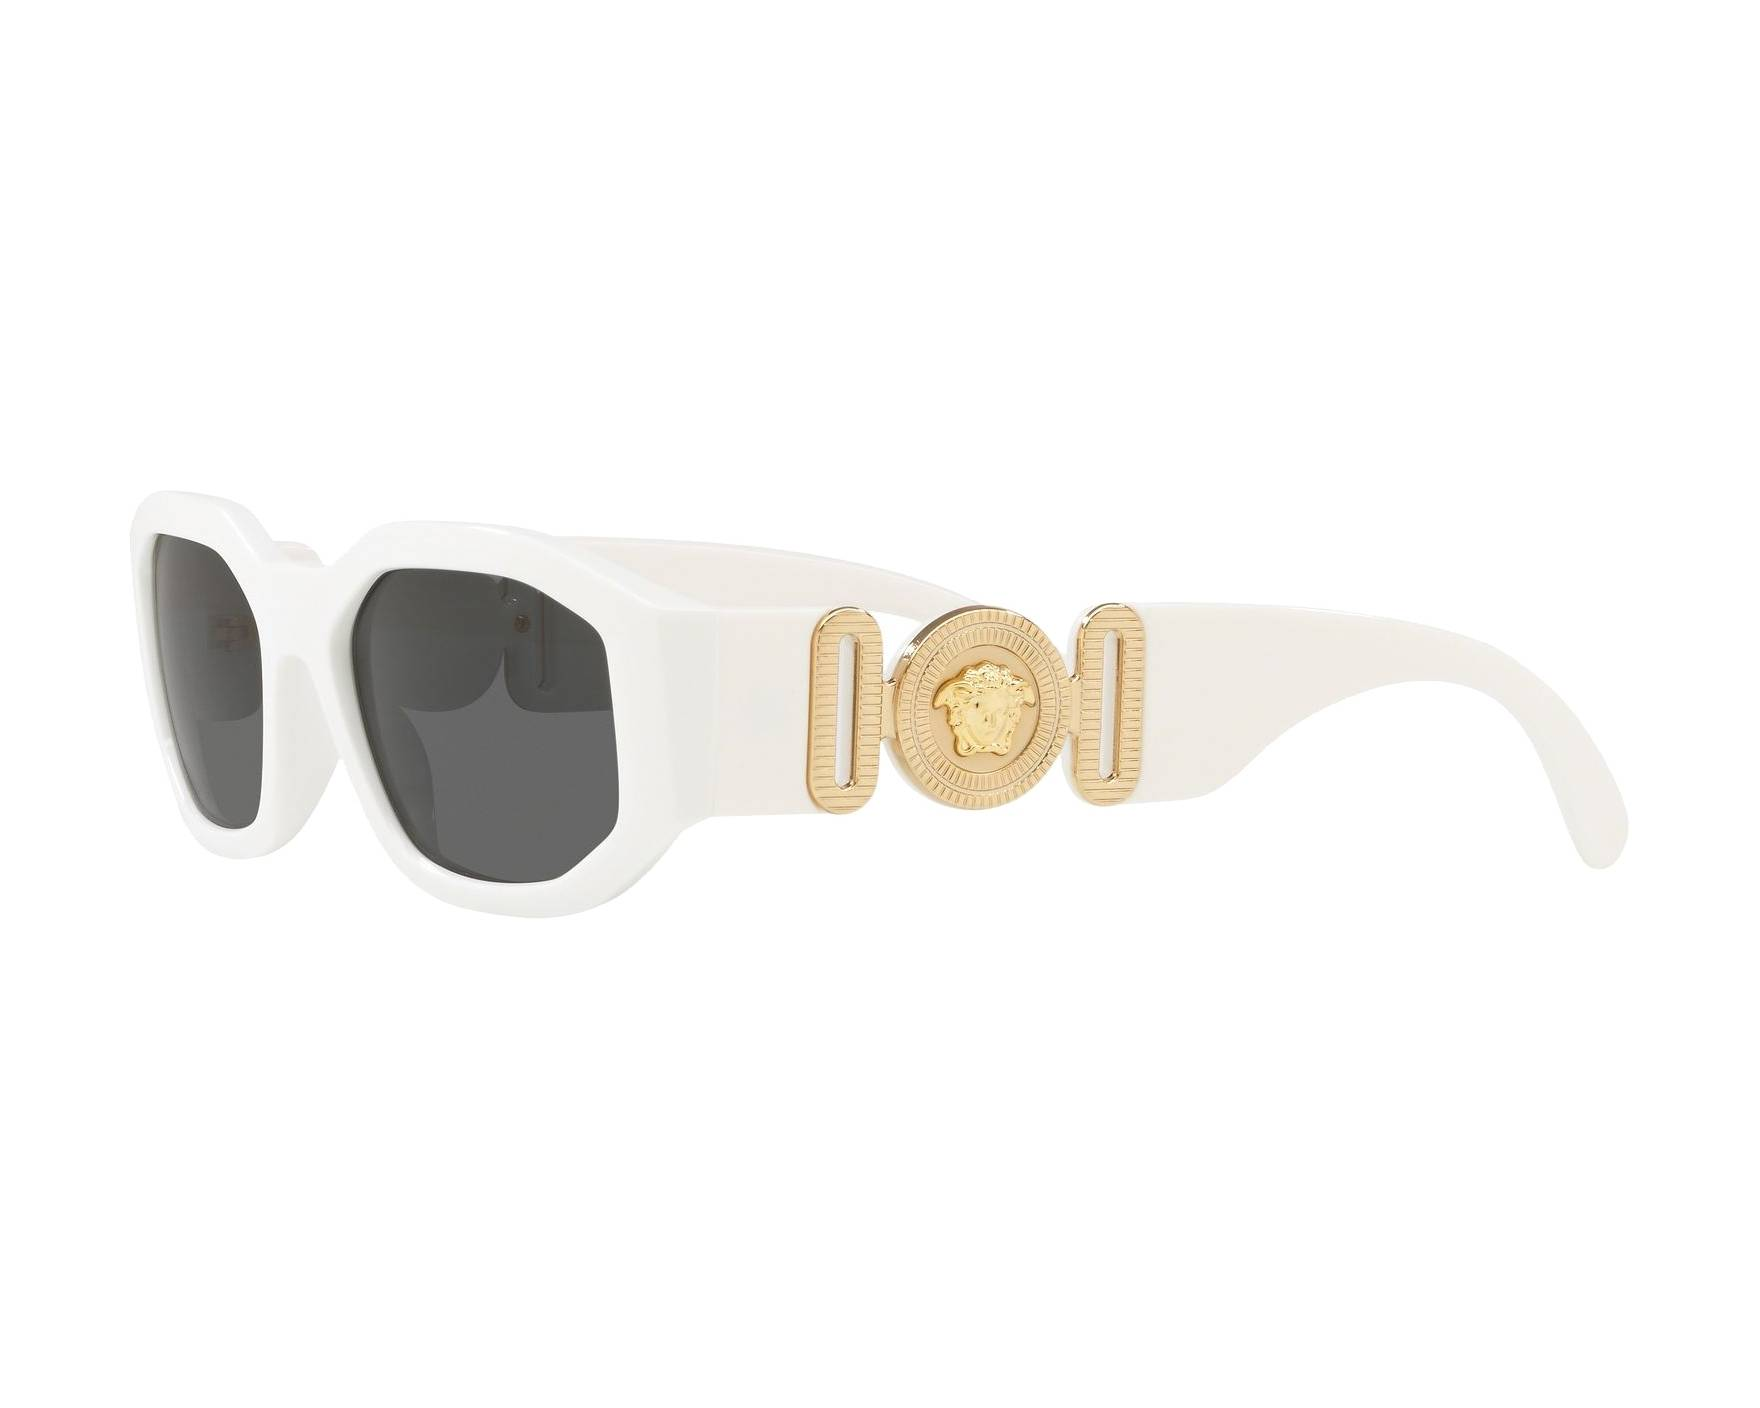 479a32367ea3d Sunglasses Versace VE-4361 401-87 53-18 White 360 degree view 3